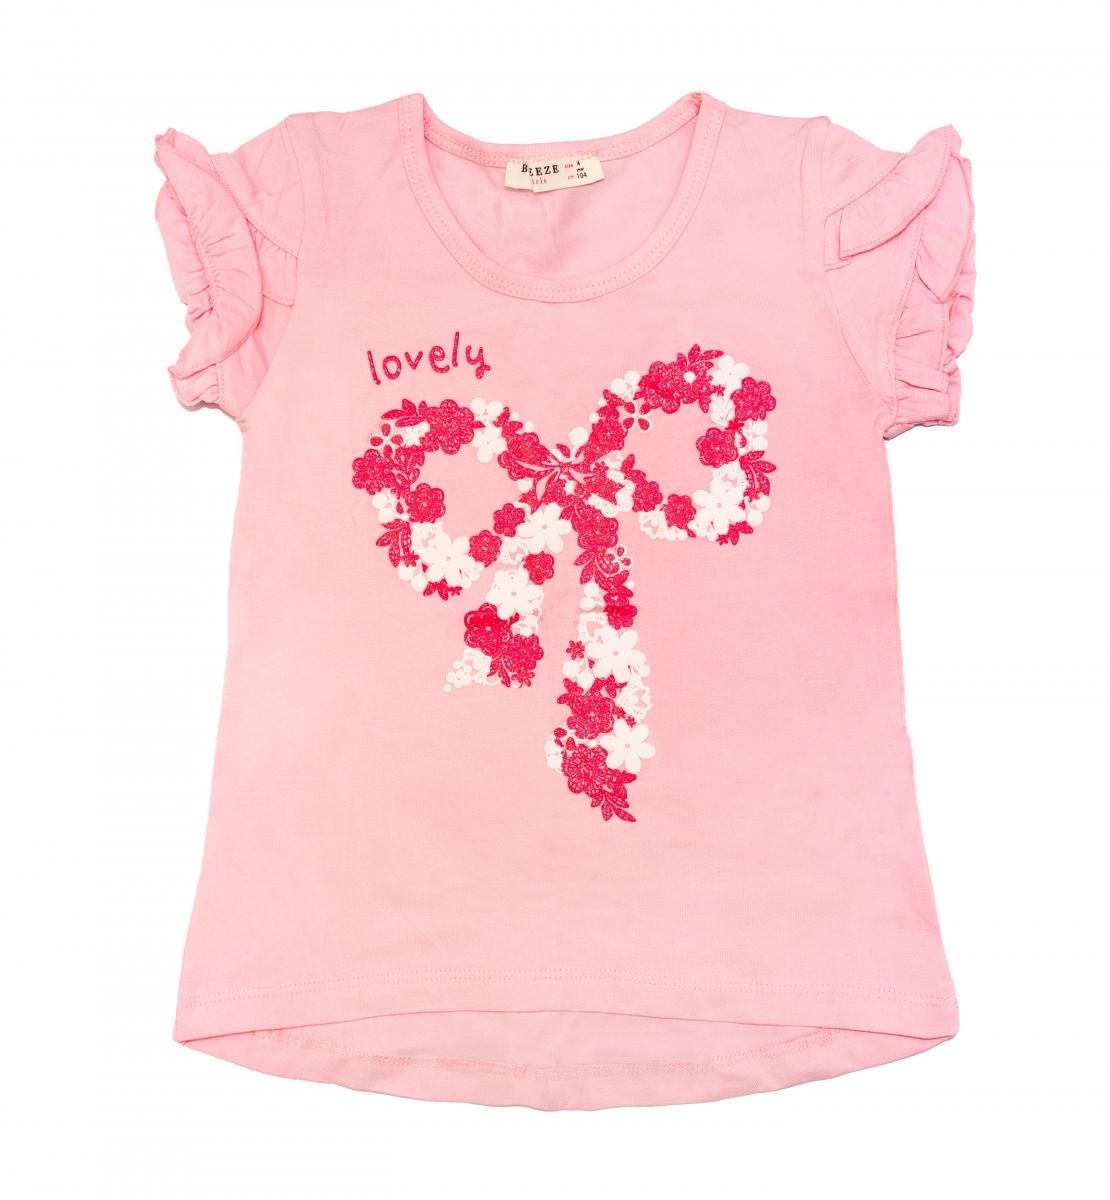 Tricouri fete breeze 1705 turcoaz 104-140cm